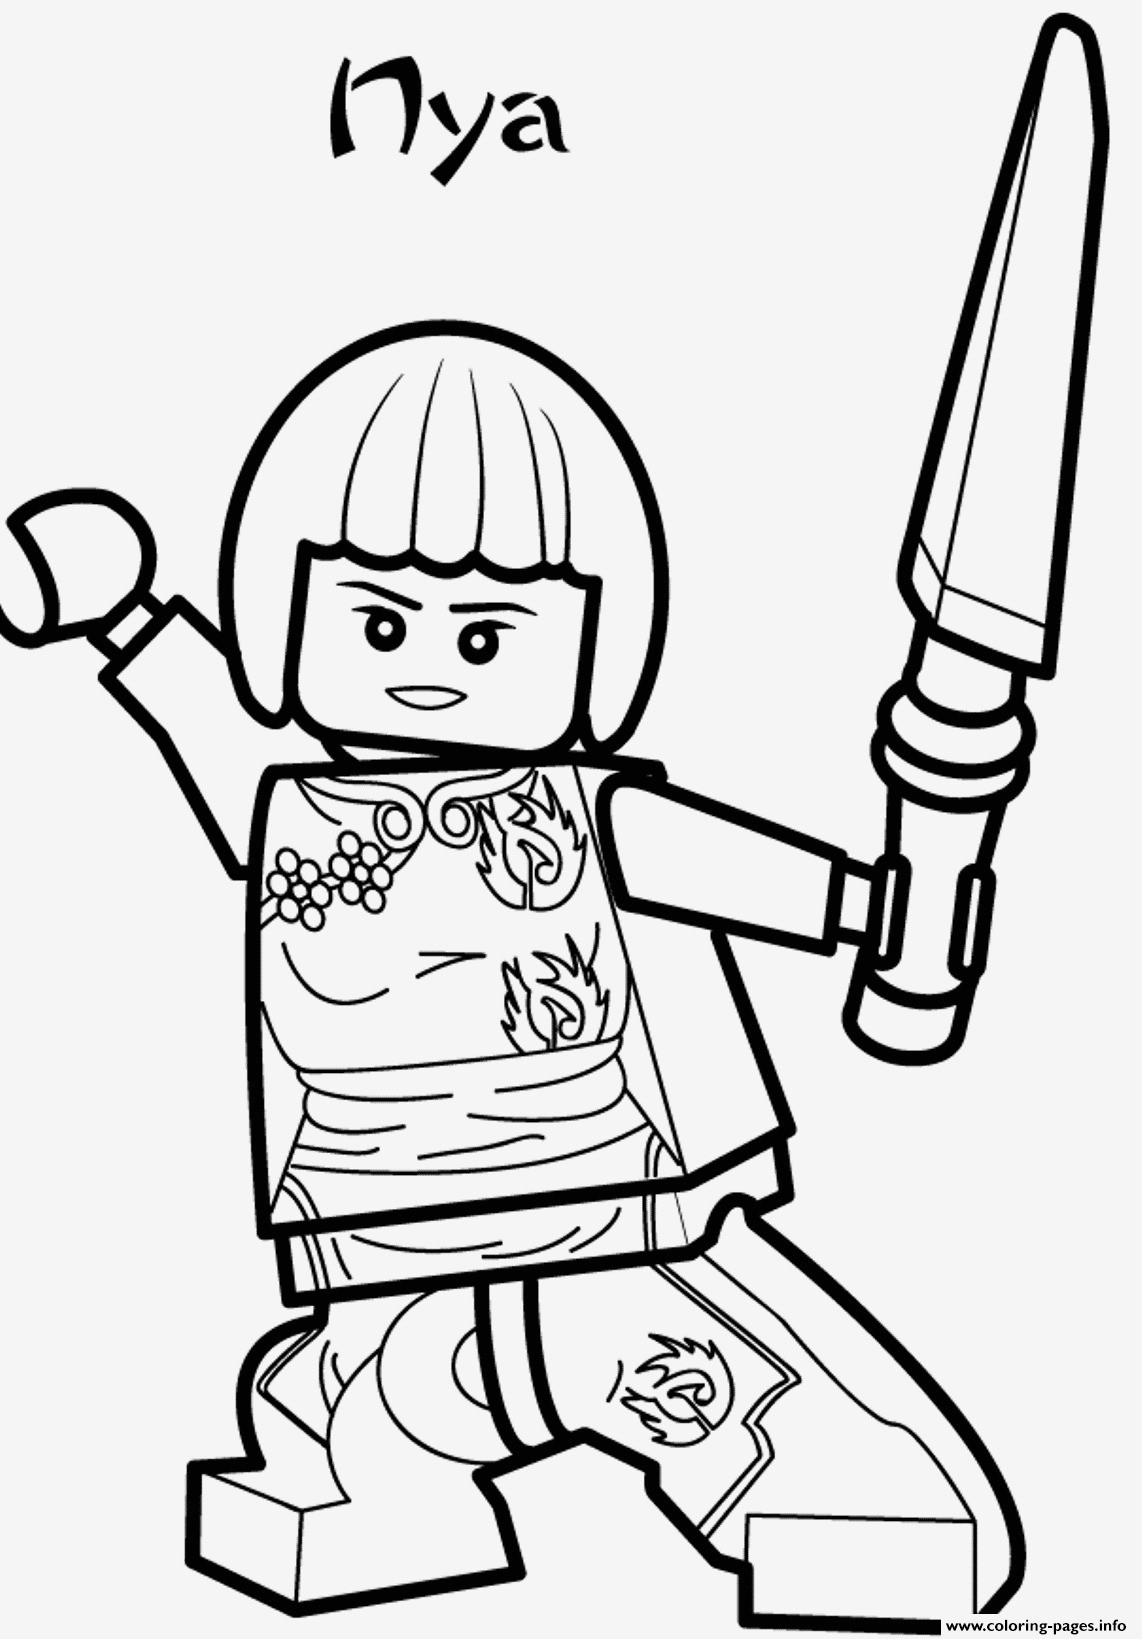 Lego Ninjago Bilder Zum Ausdrucken Genial Lego Ninjago Ausmalbild Bilder Zum Ausmalen Bekommen Ninjago Jay Fotos